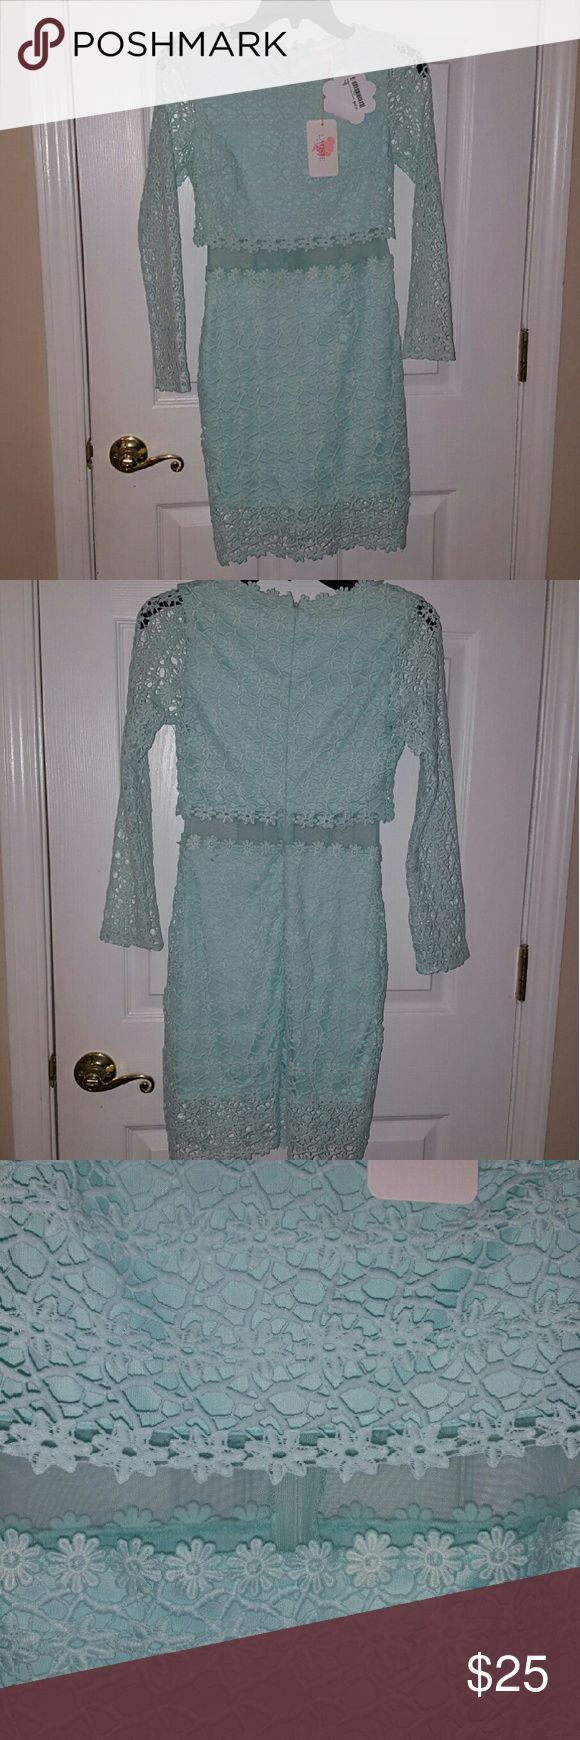 Dress Mint green, crochet, mint green, mesh middle (see picture), Shop Hope's, BNWT, super cute, long sleeve, Juniors small. L'atiste  (Shop Hopes) Dresses Mini